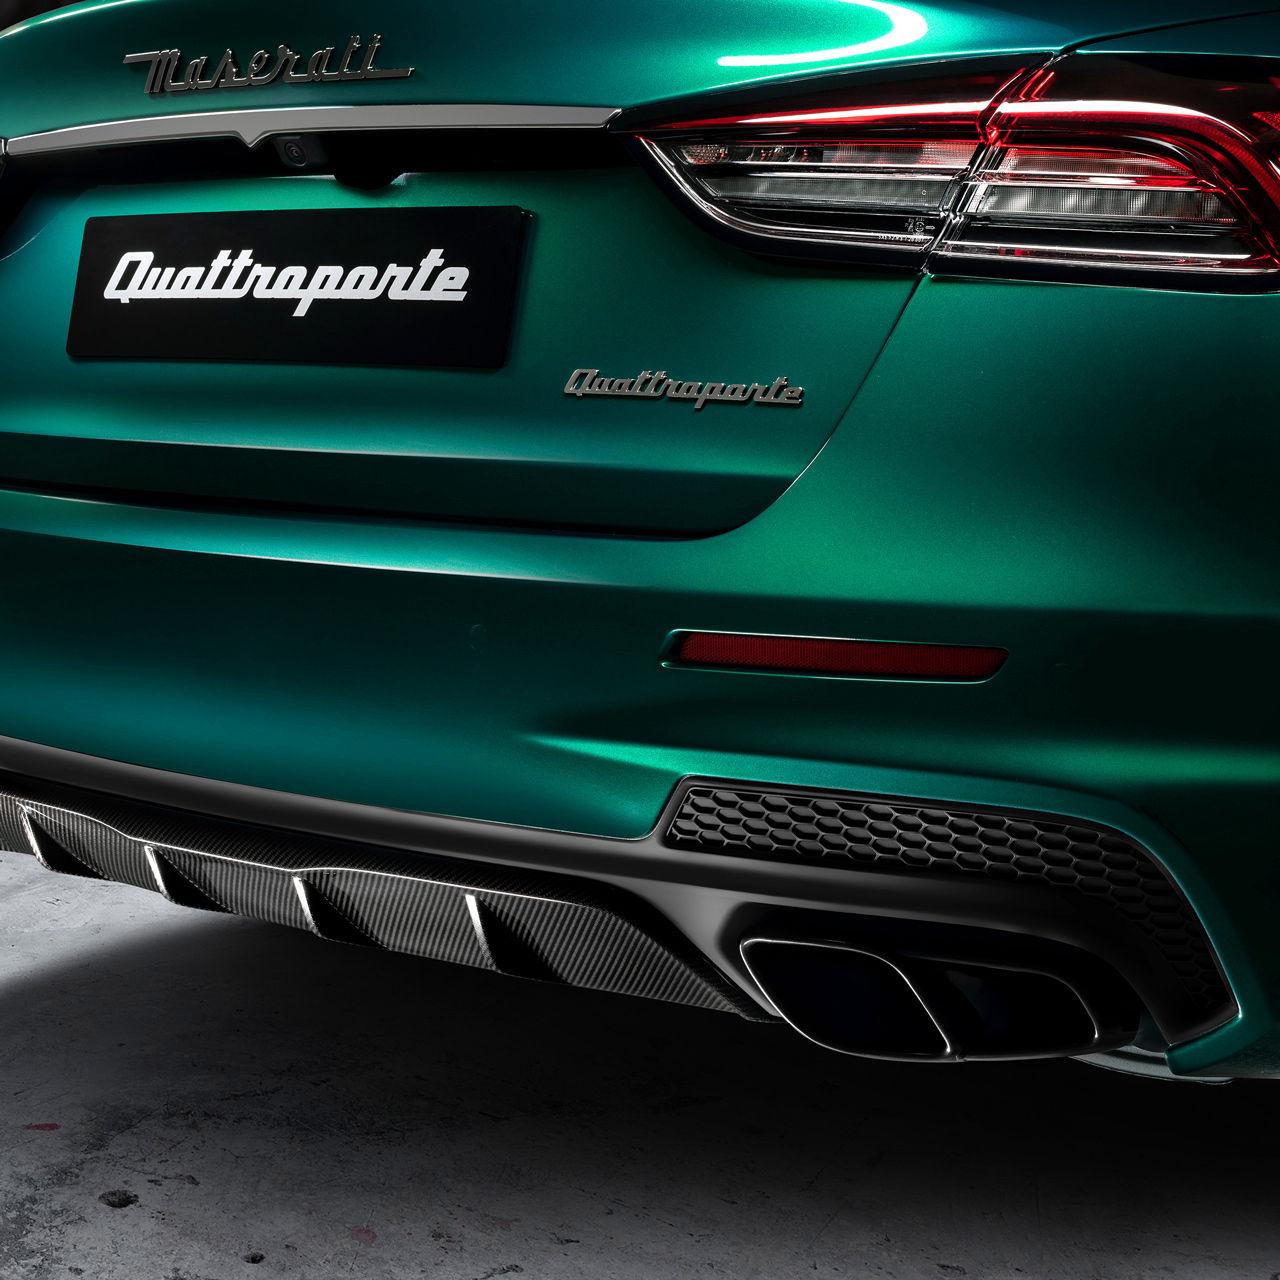 Maserati Quattroporte Trofeo - Grün - Auspuff und Klang